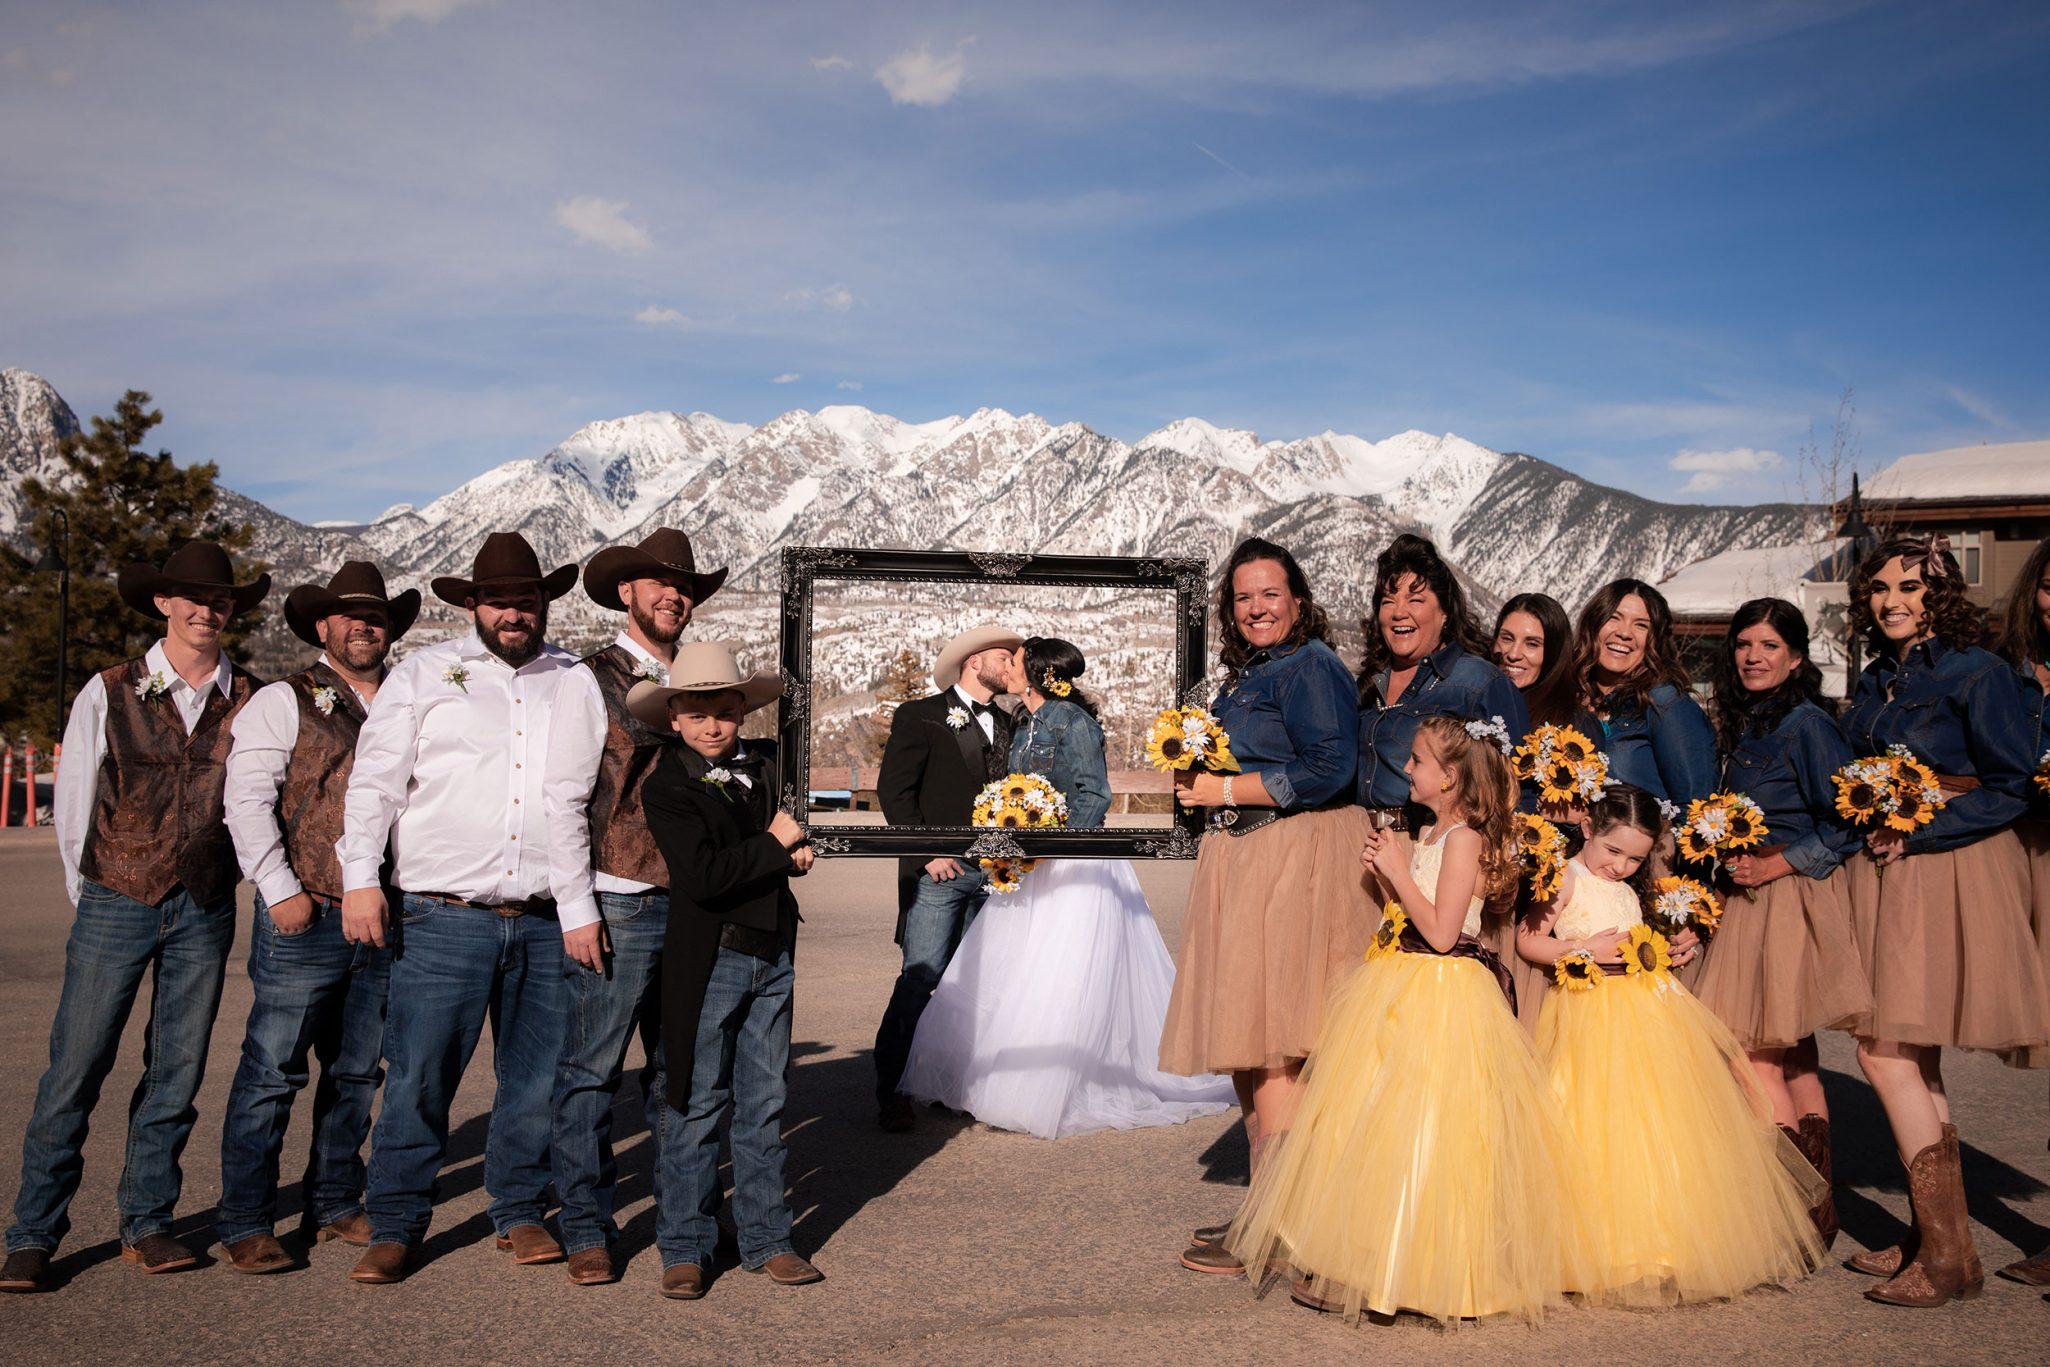 Bride + groom kiss at Purgatory Resort, Durango Colorado